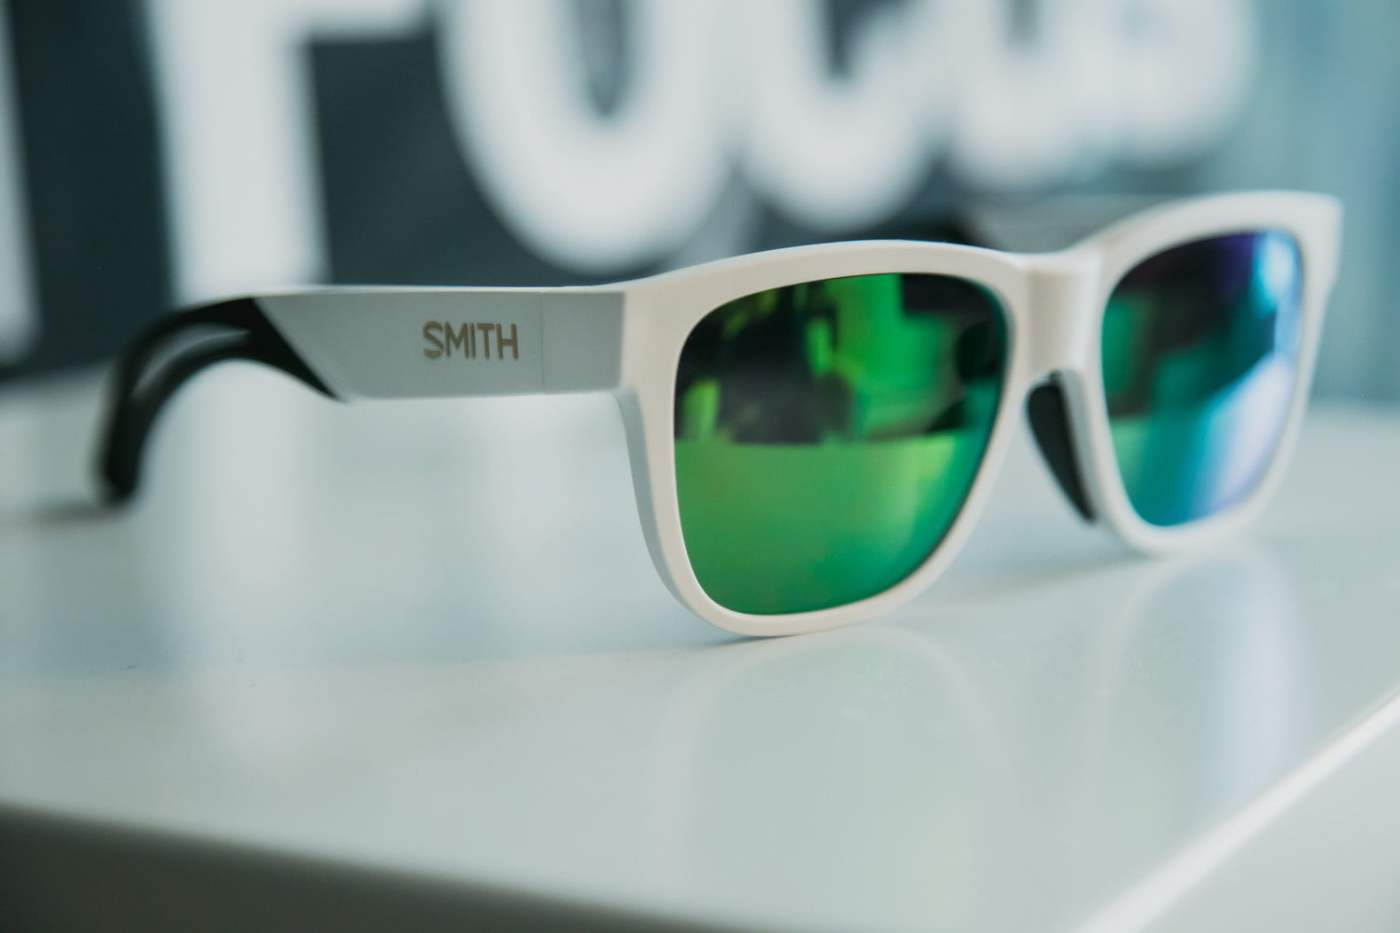 Smith Performance sunglasses.